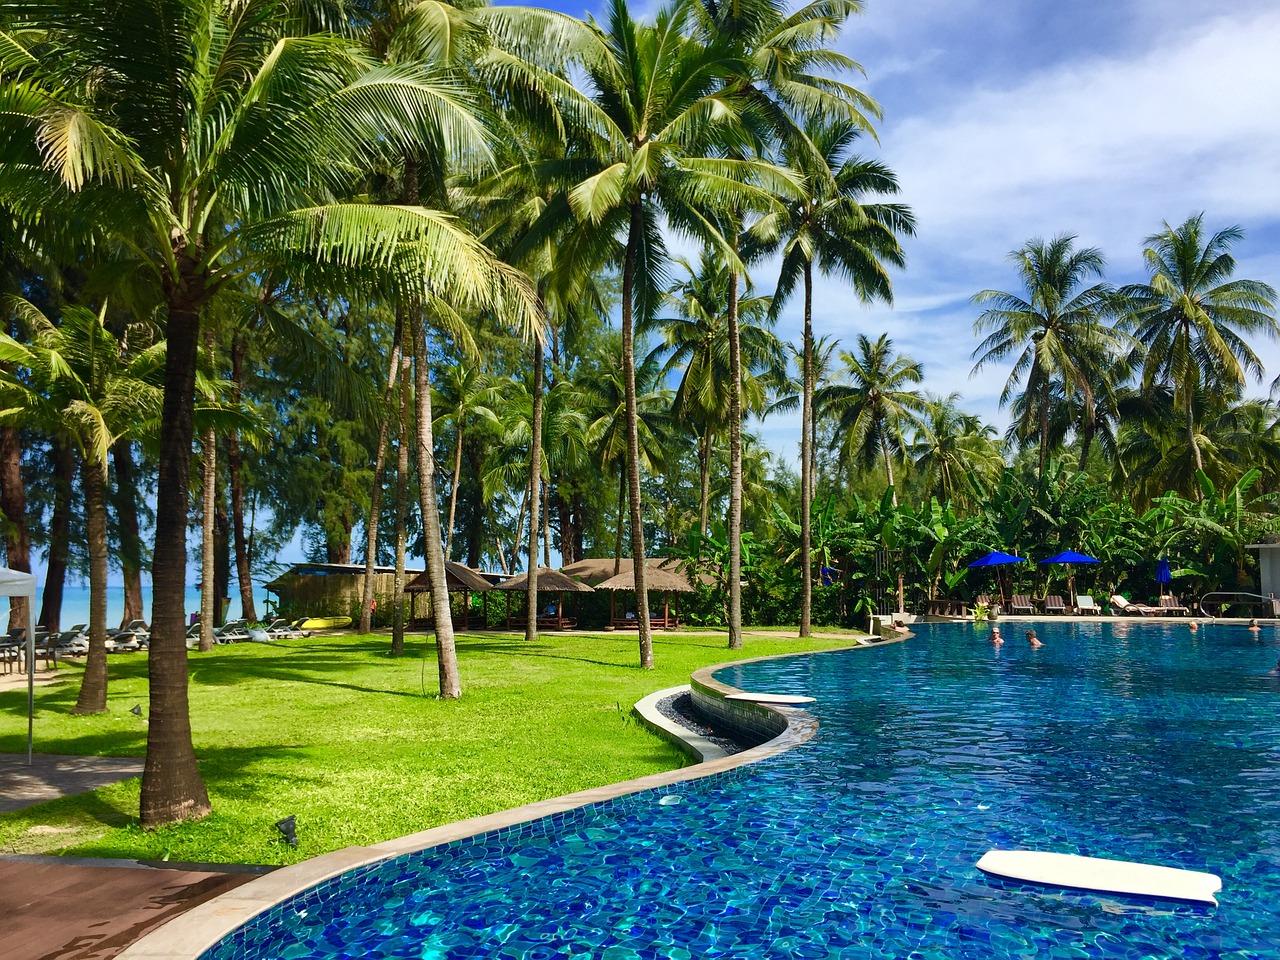 Thailand Beach Resort Travel Vacation Free Photo From